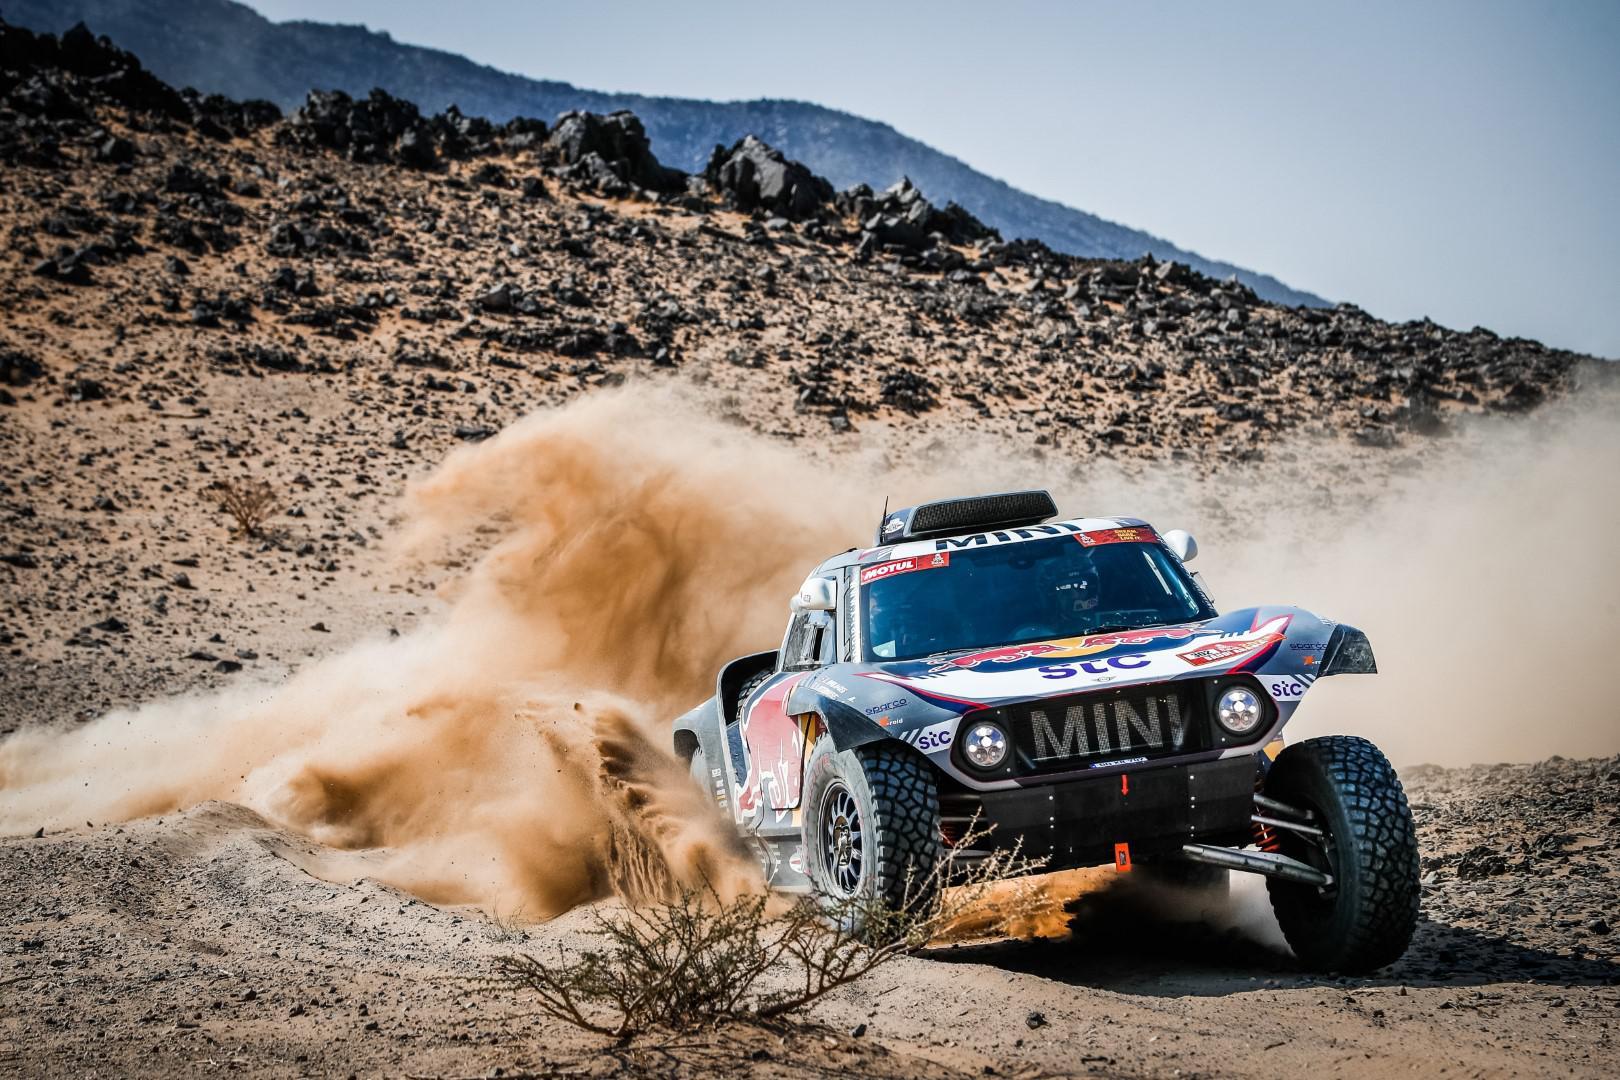 rally-dakar-2021-6eme-victoire-au-general-pour-mini-1416-12.jpg